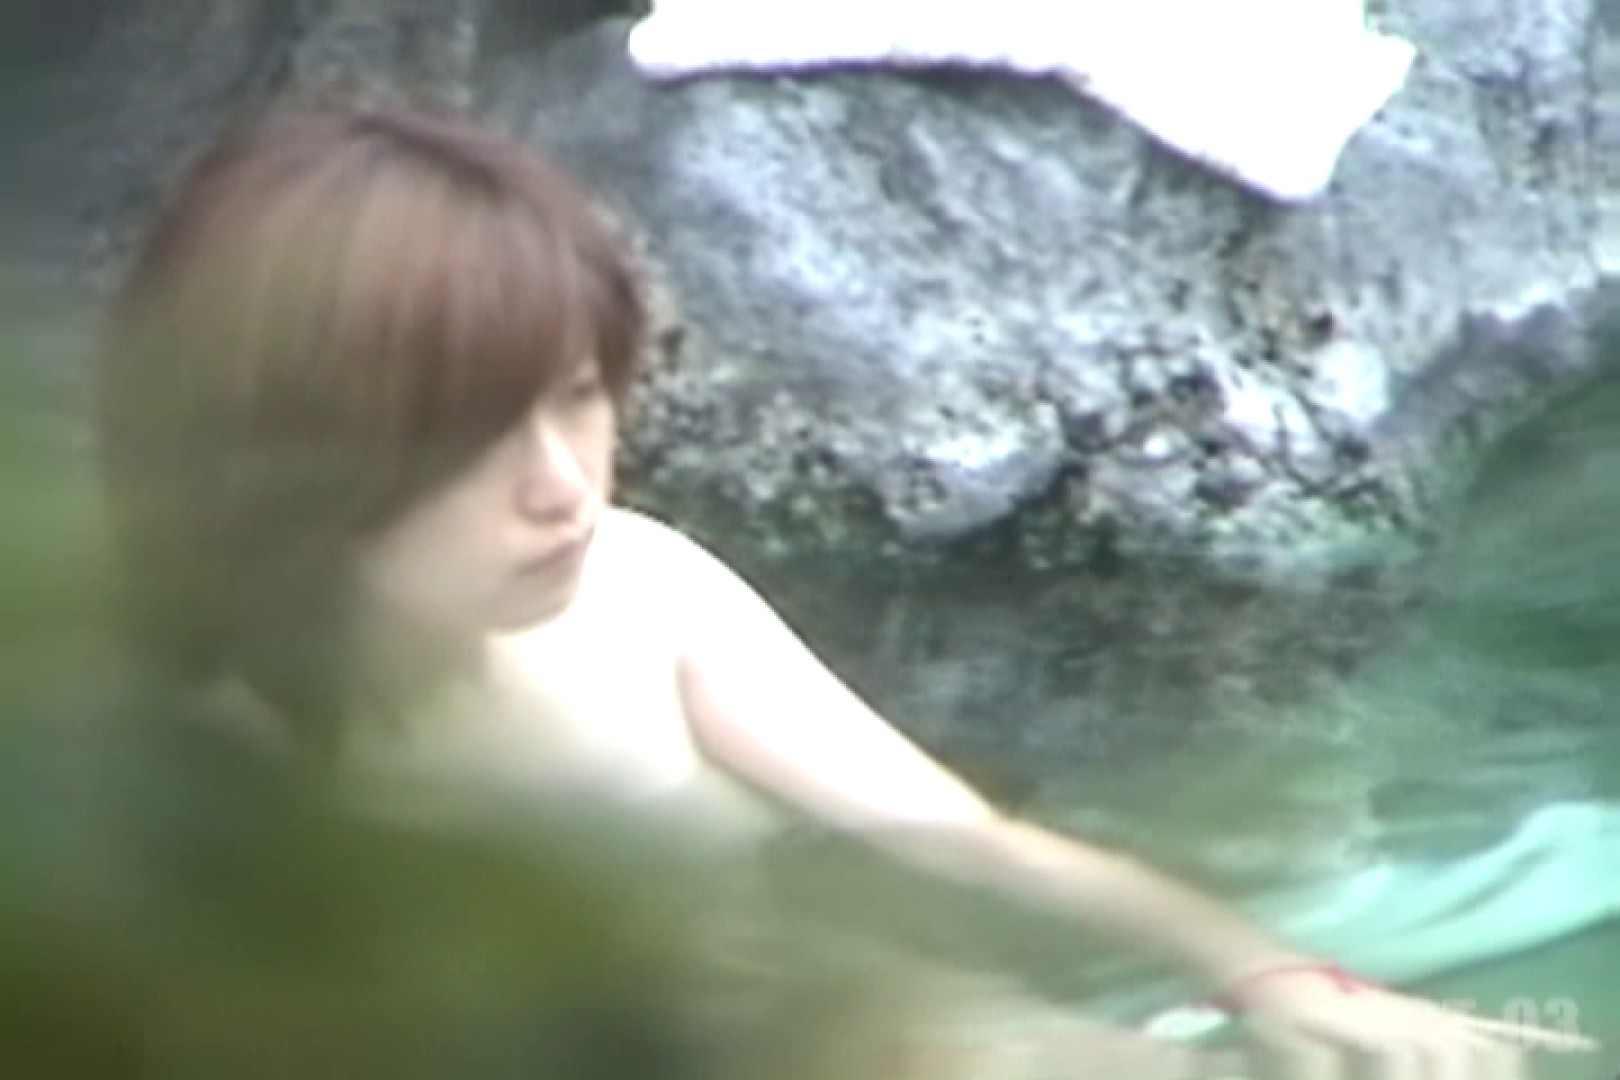 Aquaな露天風呂Vol.731 露天風呂編  76PIX 40